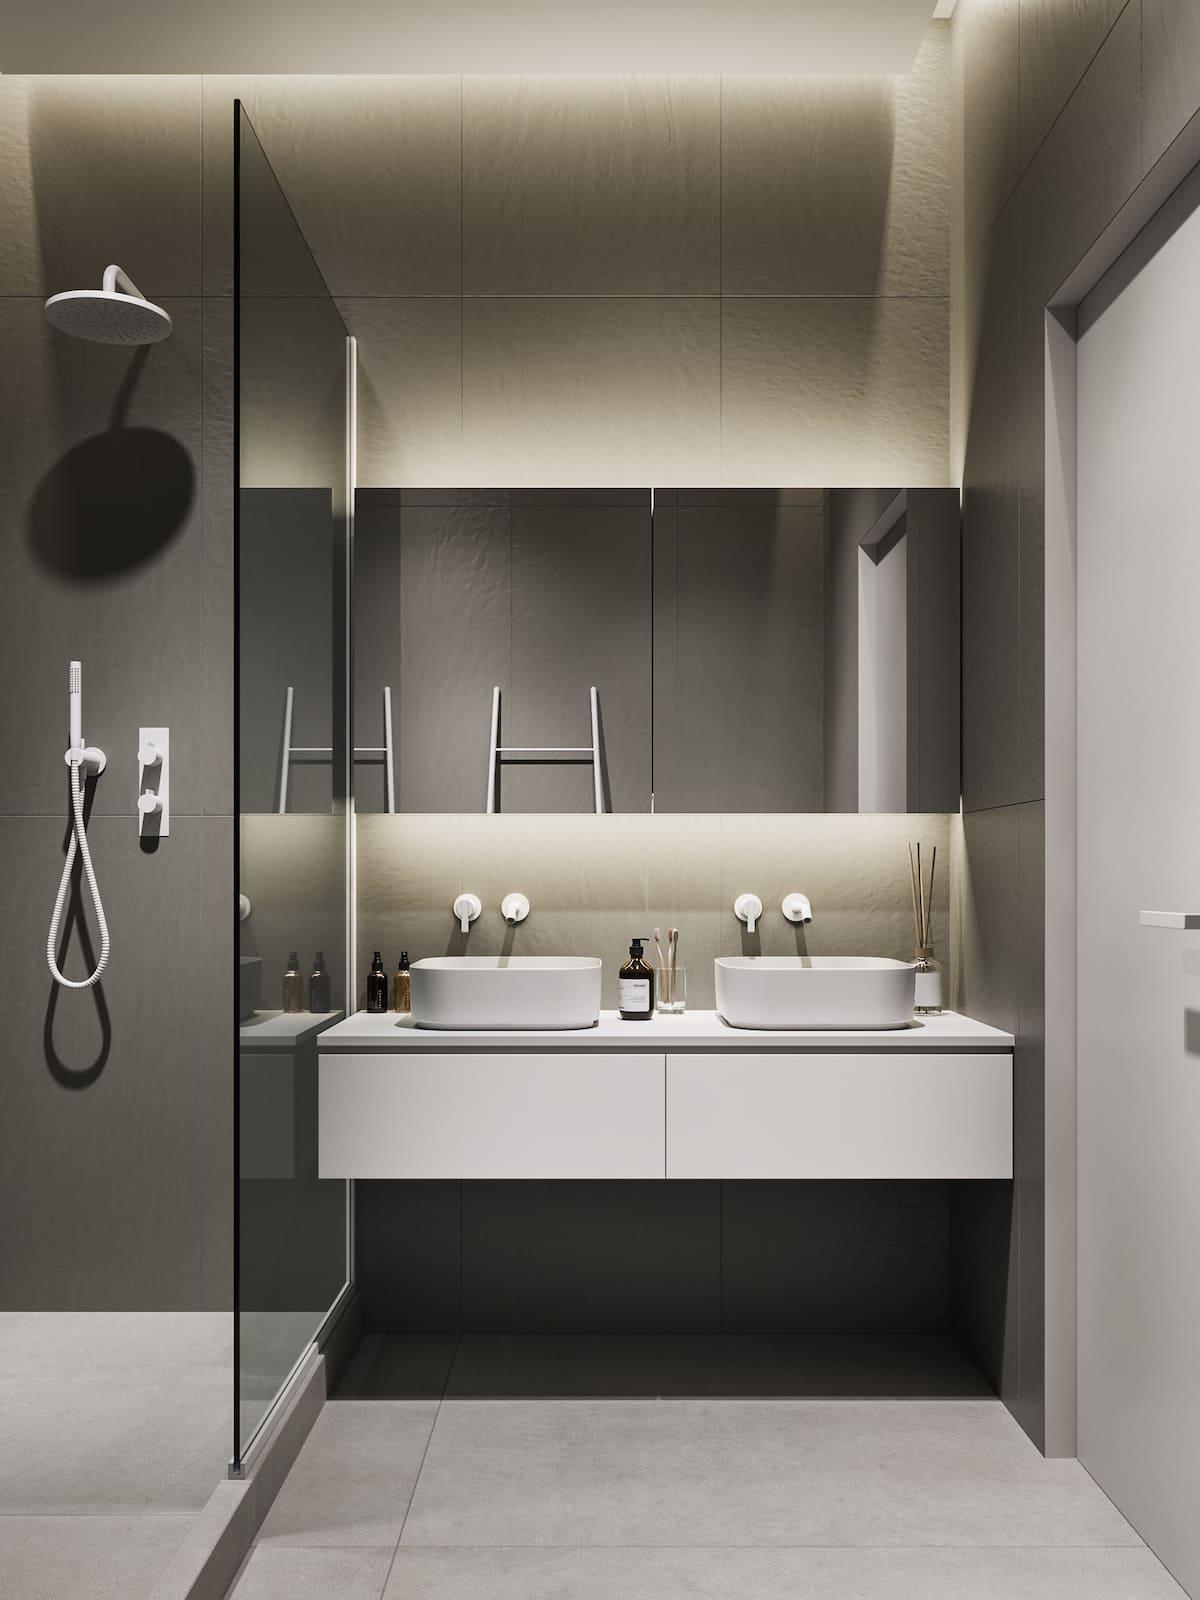 дизайн интерьера модной квартиры фото 51